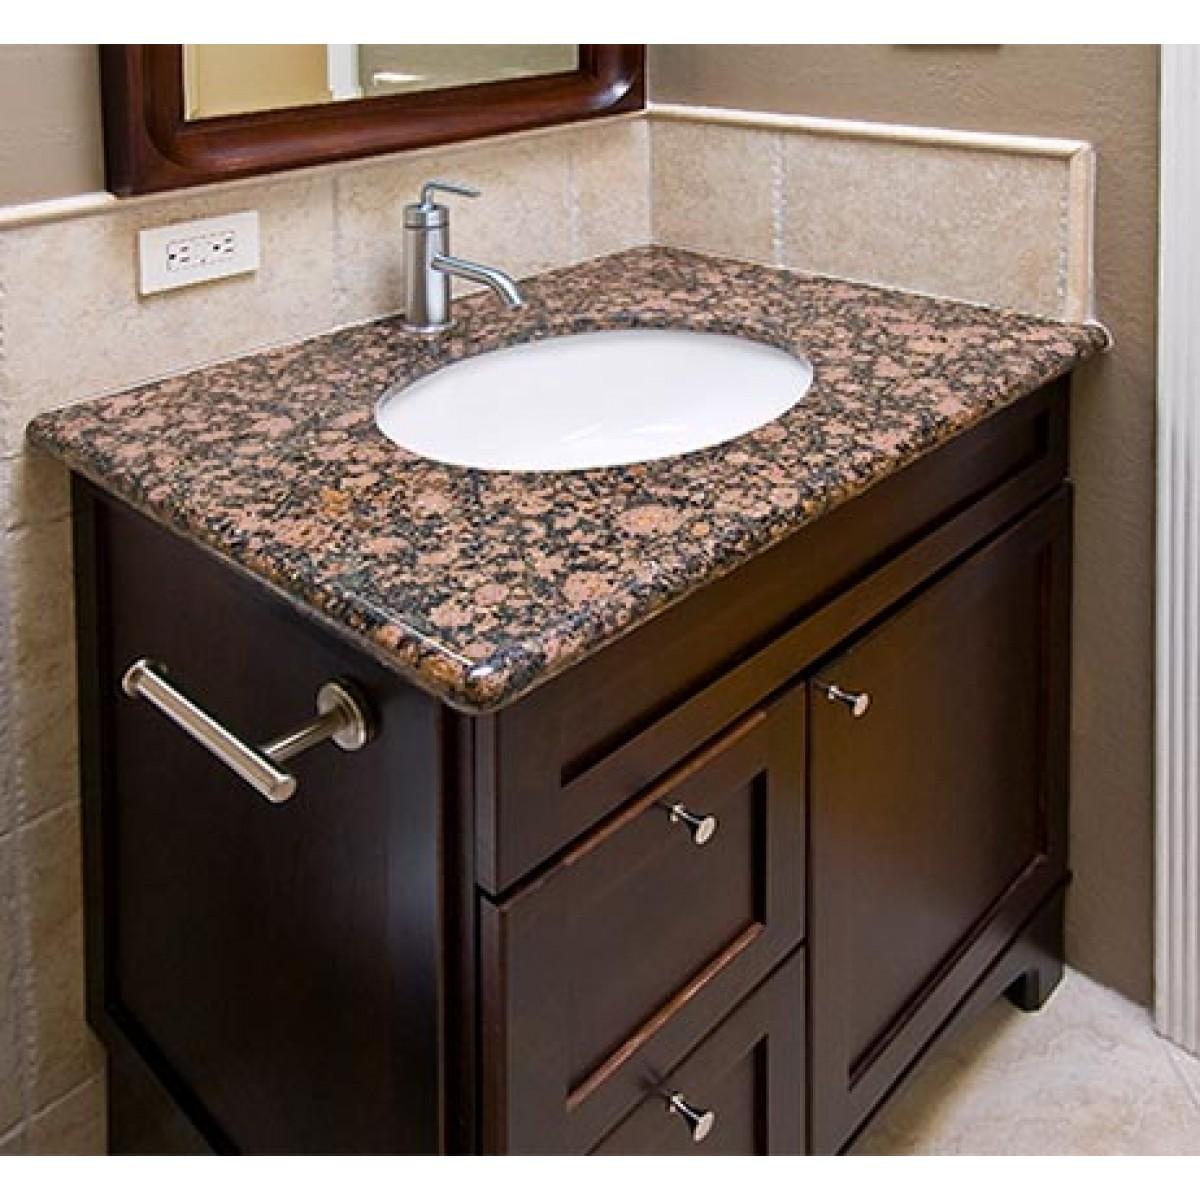 Porcelain Ceramic Vanity Undermount Bathroom Vessel Sink ...